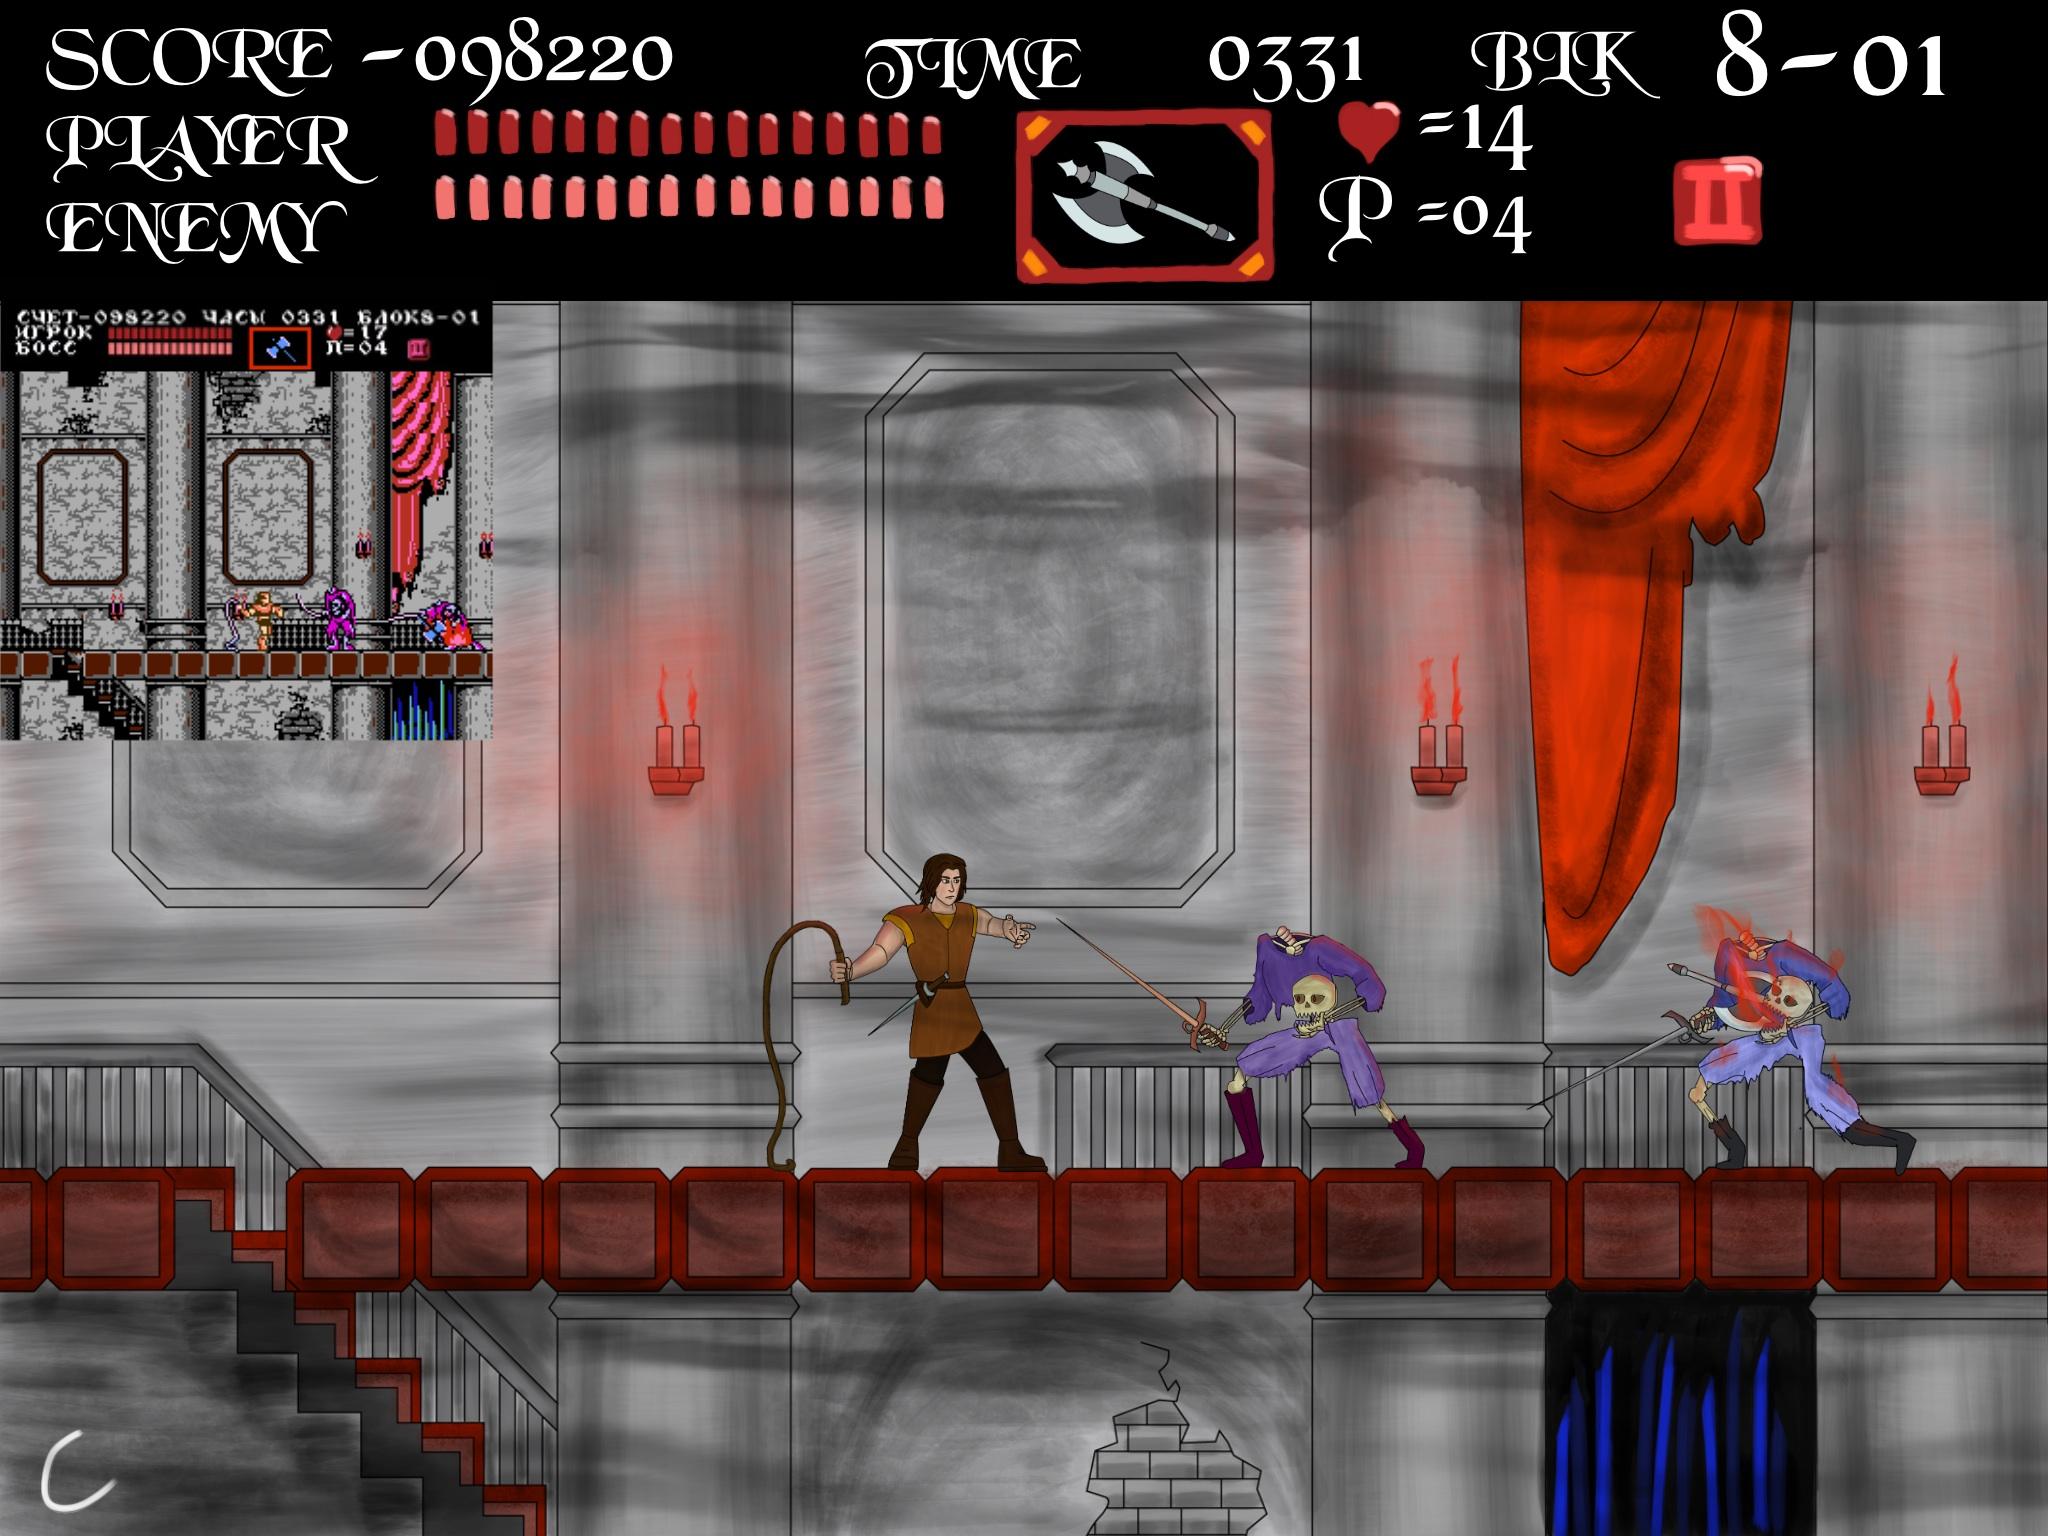 Castlevania 3: The Inner Halls